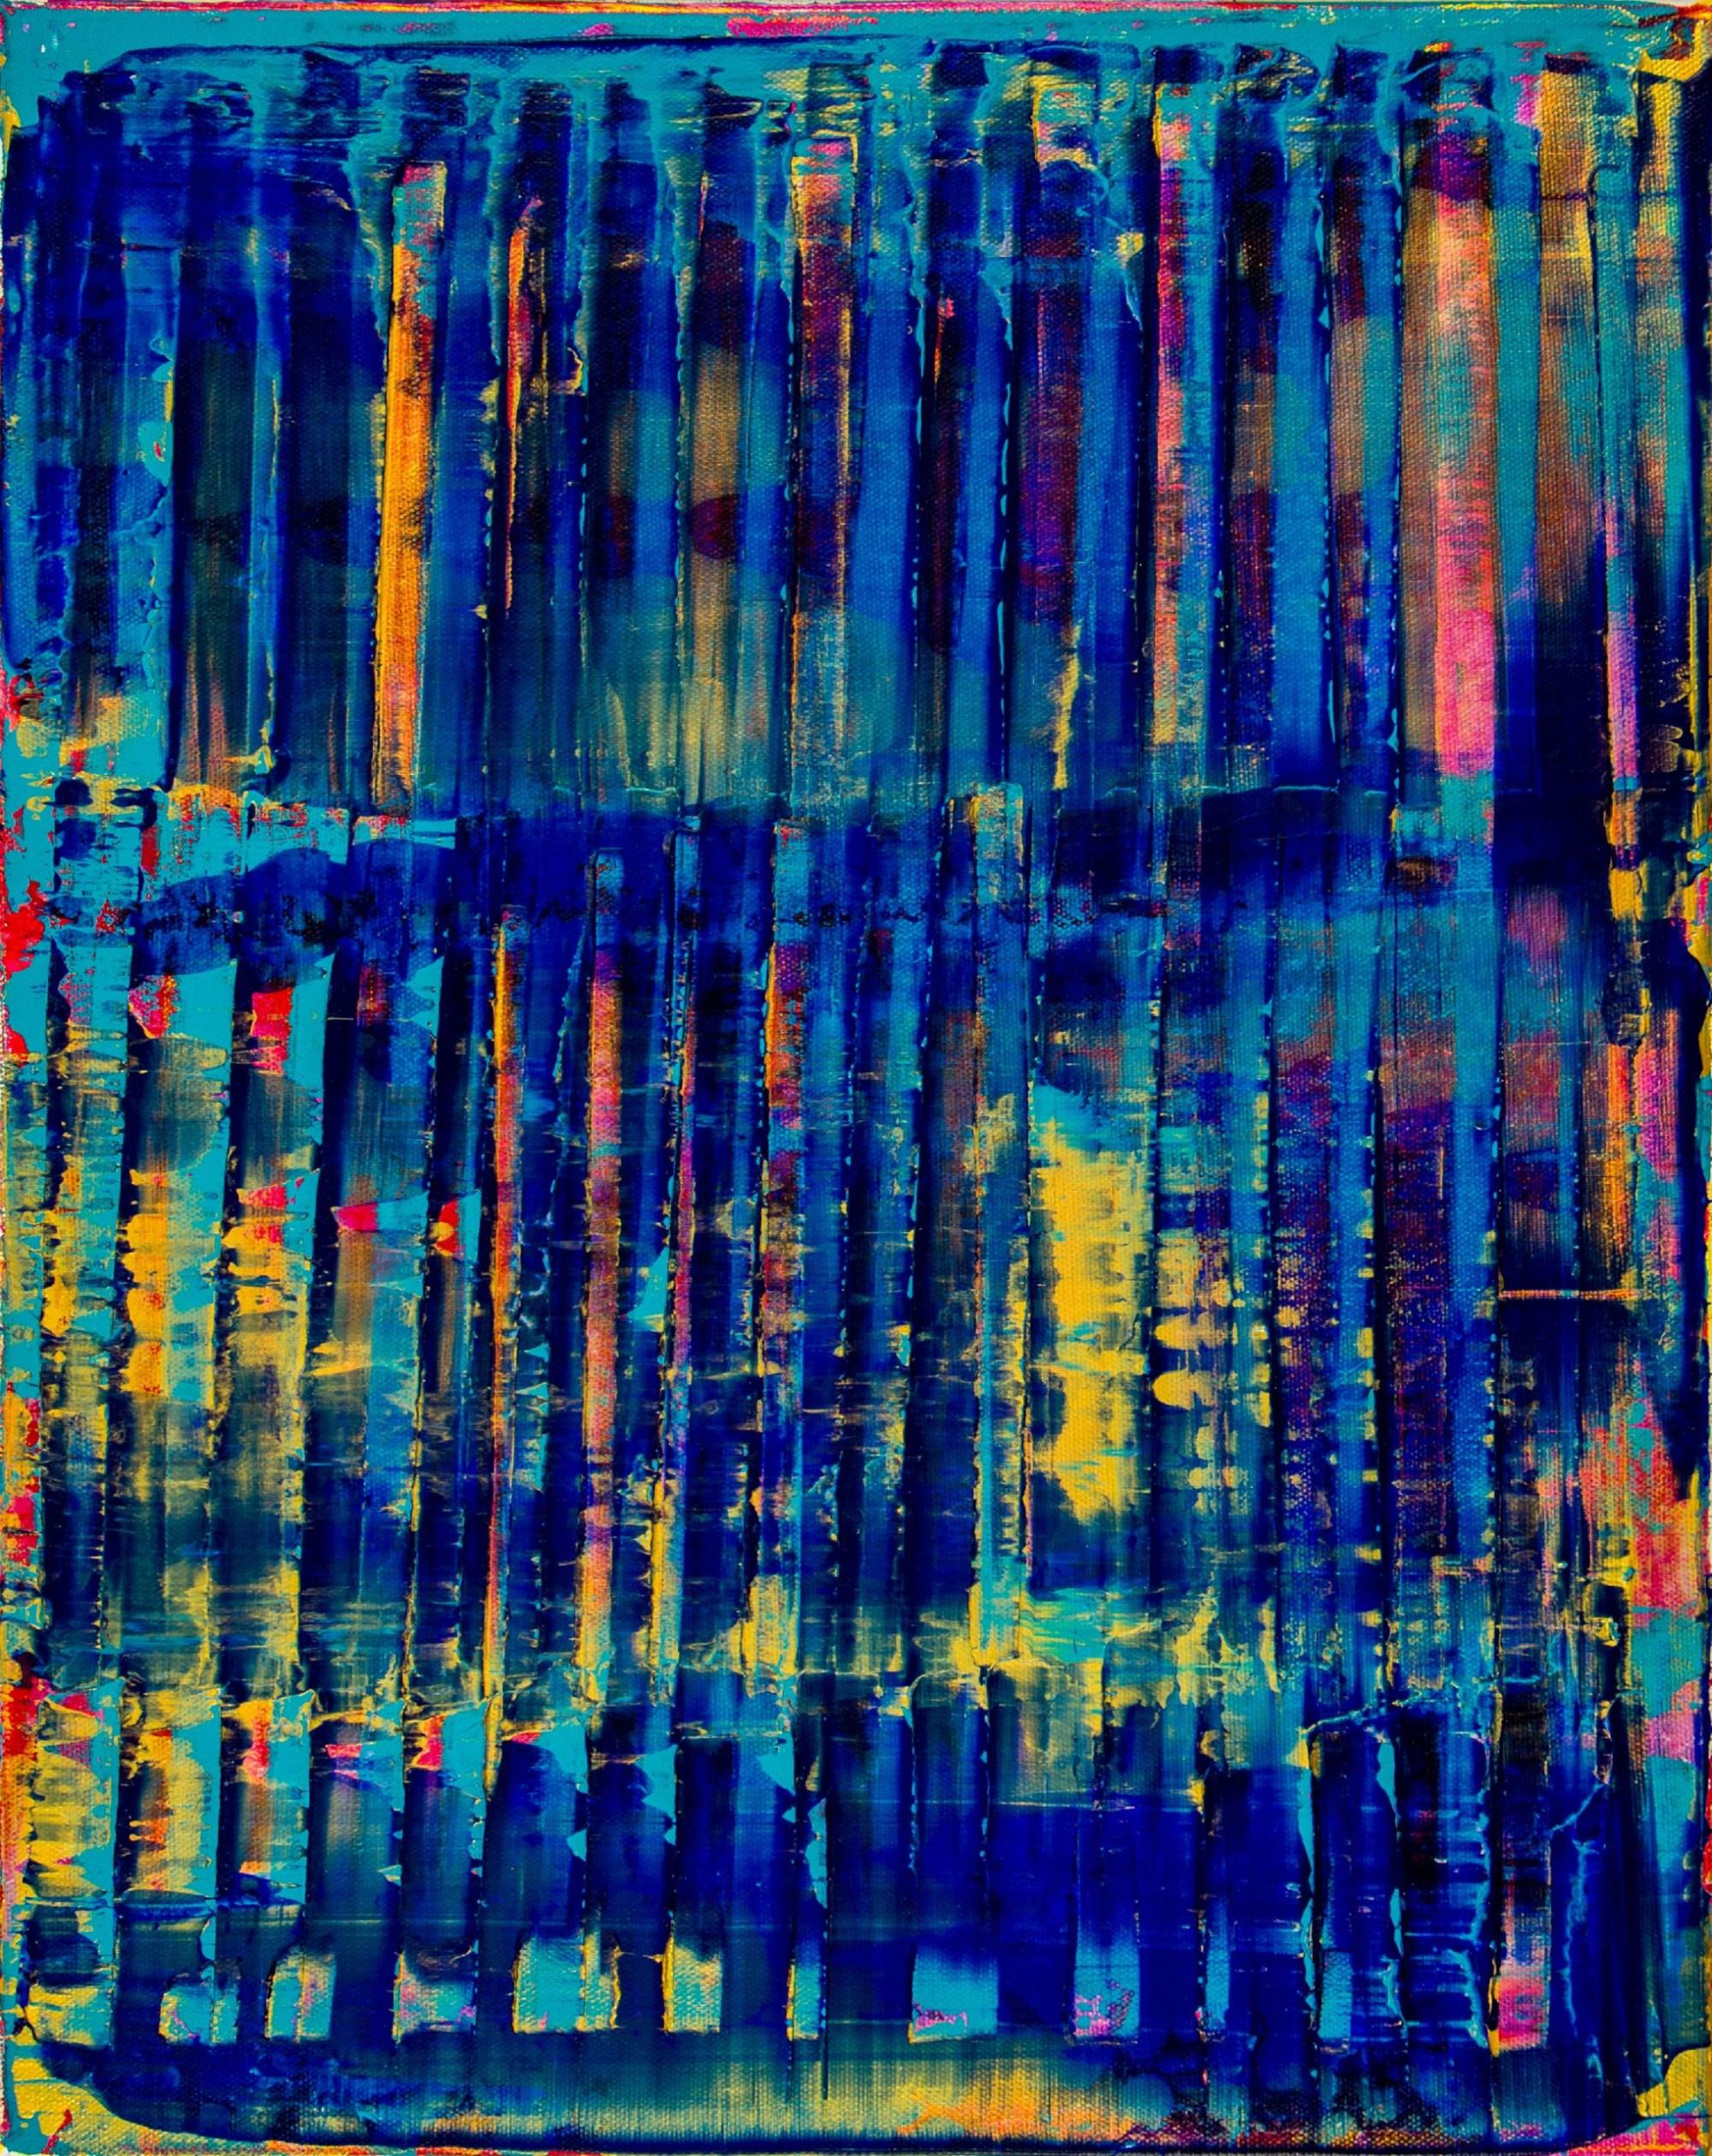 Canvas #2 / Breeze Intrusion (Gold Cracks) 2020 / Triptych by Nestor Toro